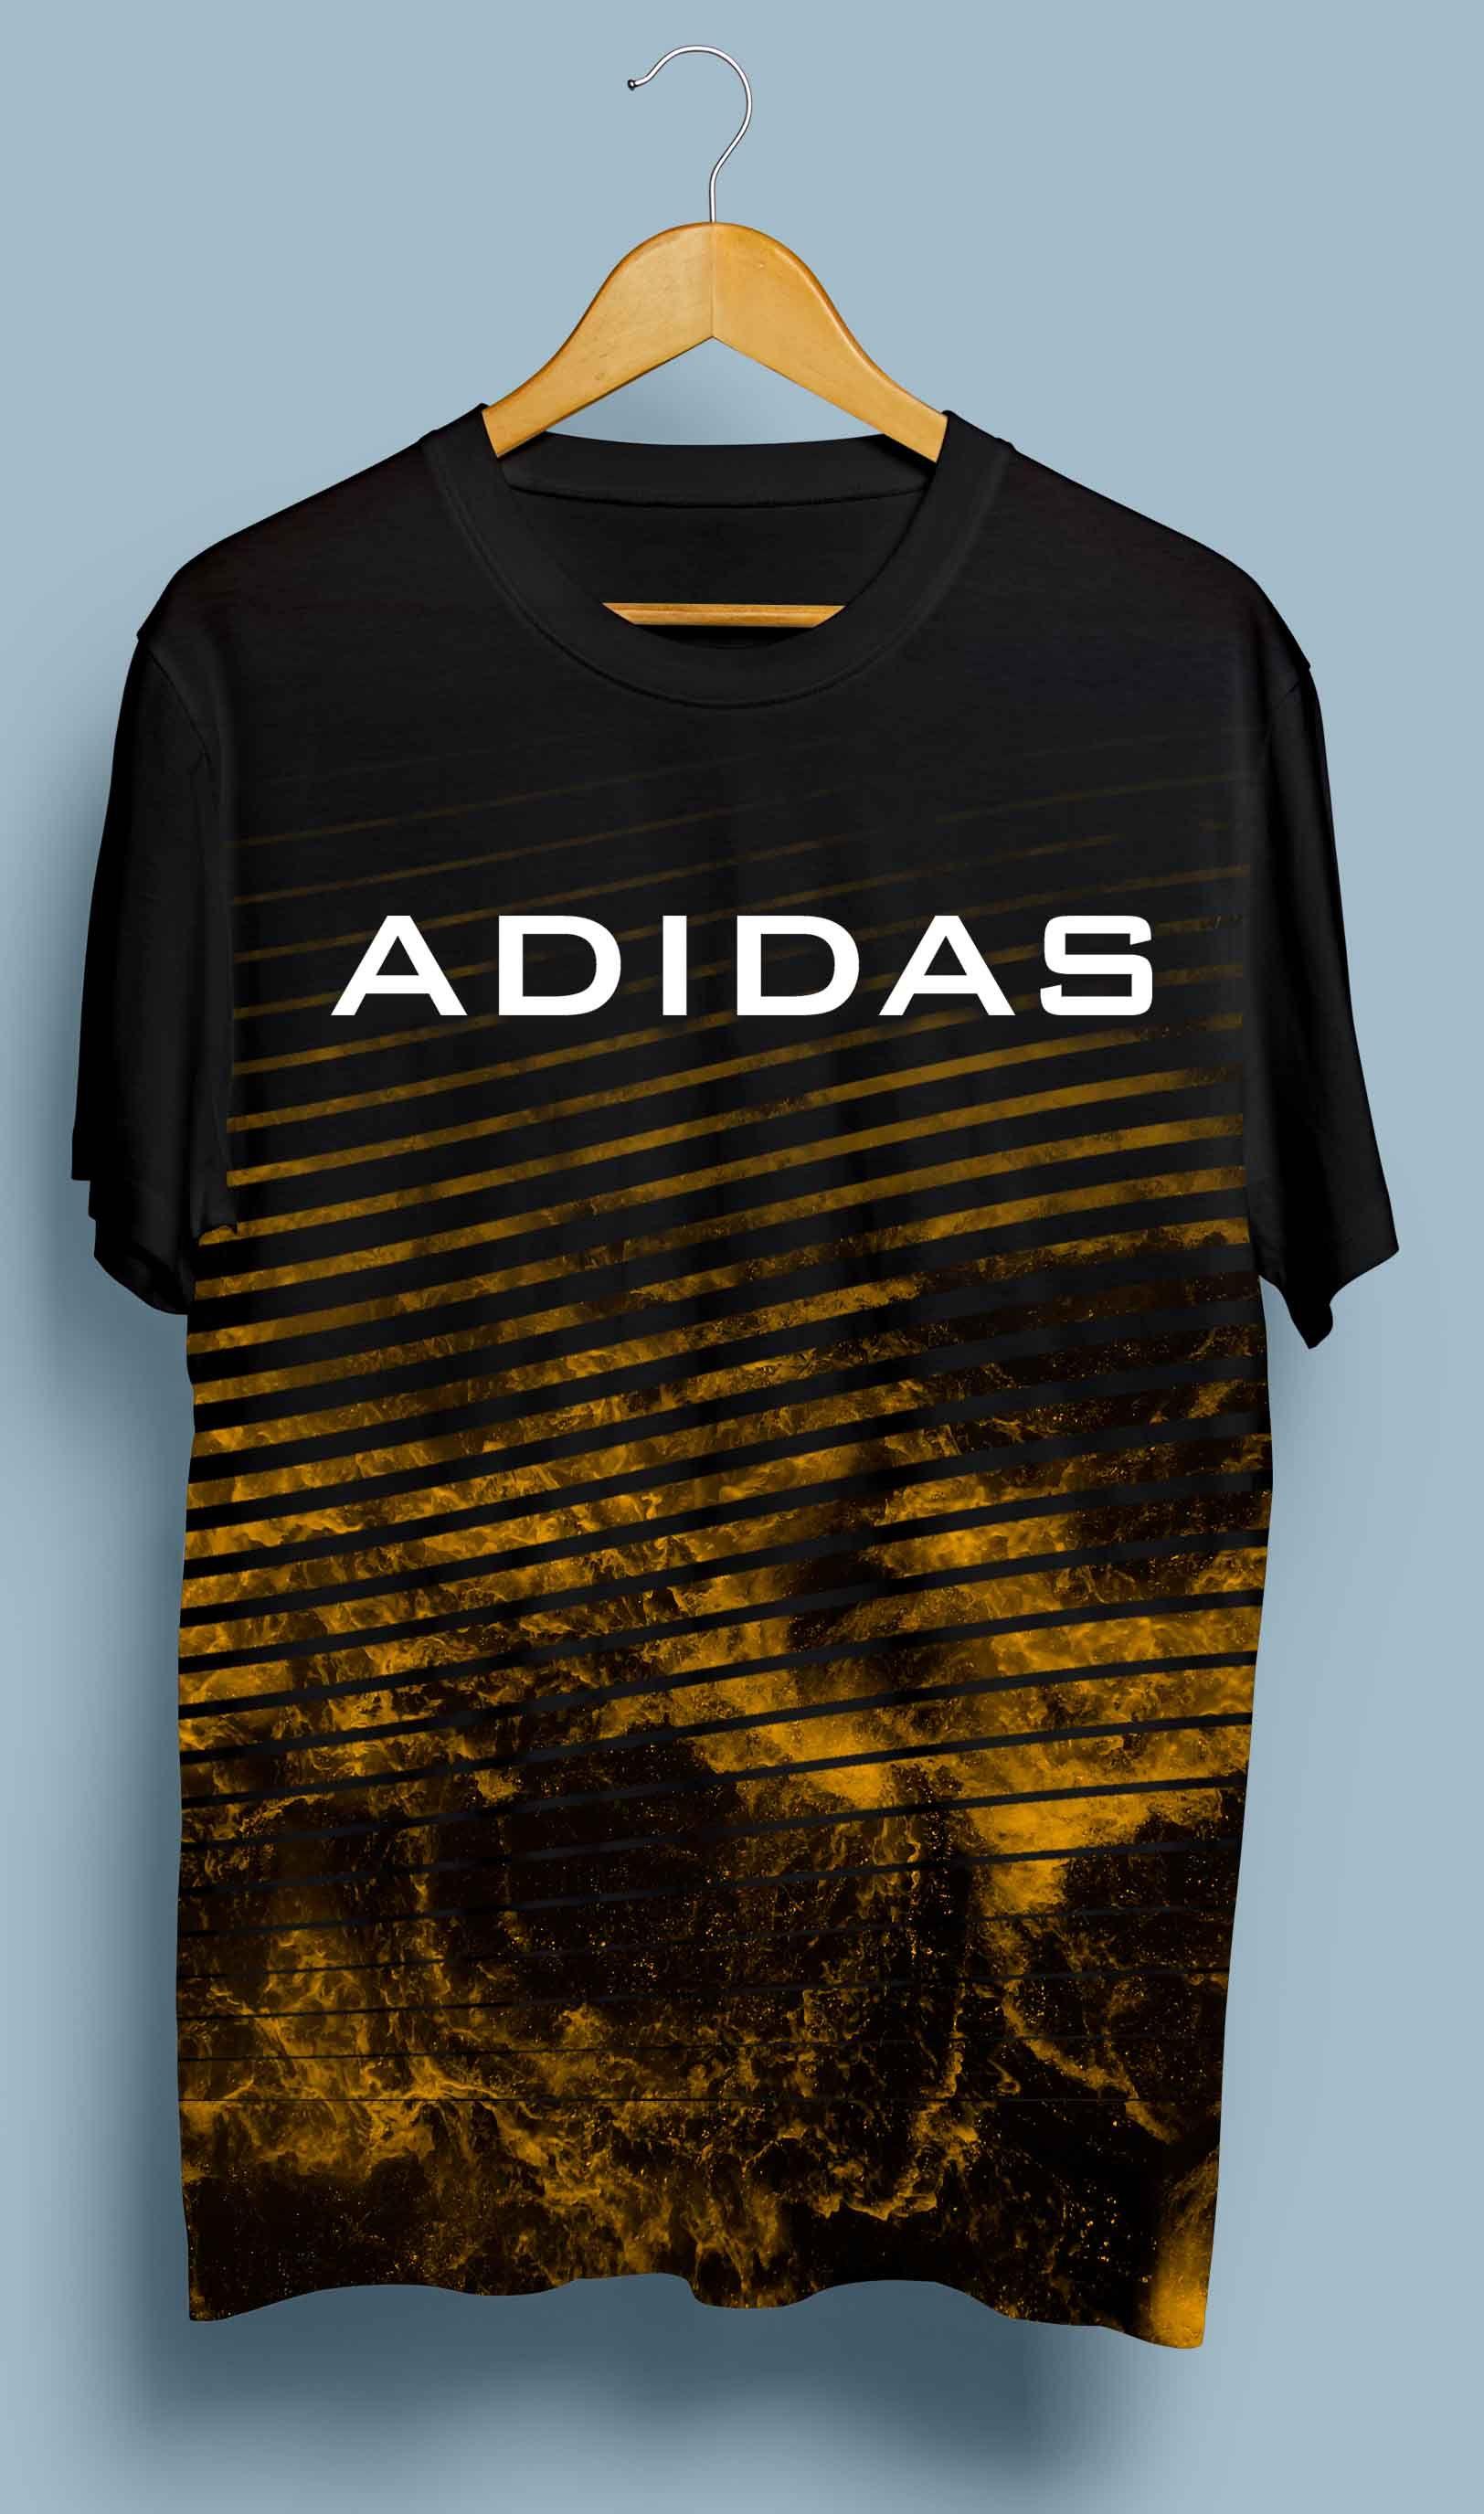 Quiksilver plain black t shirt - Tees Adidas Surf Tees Dc T Shirtdesign Dcshoecousa T